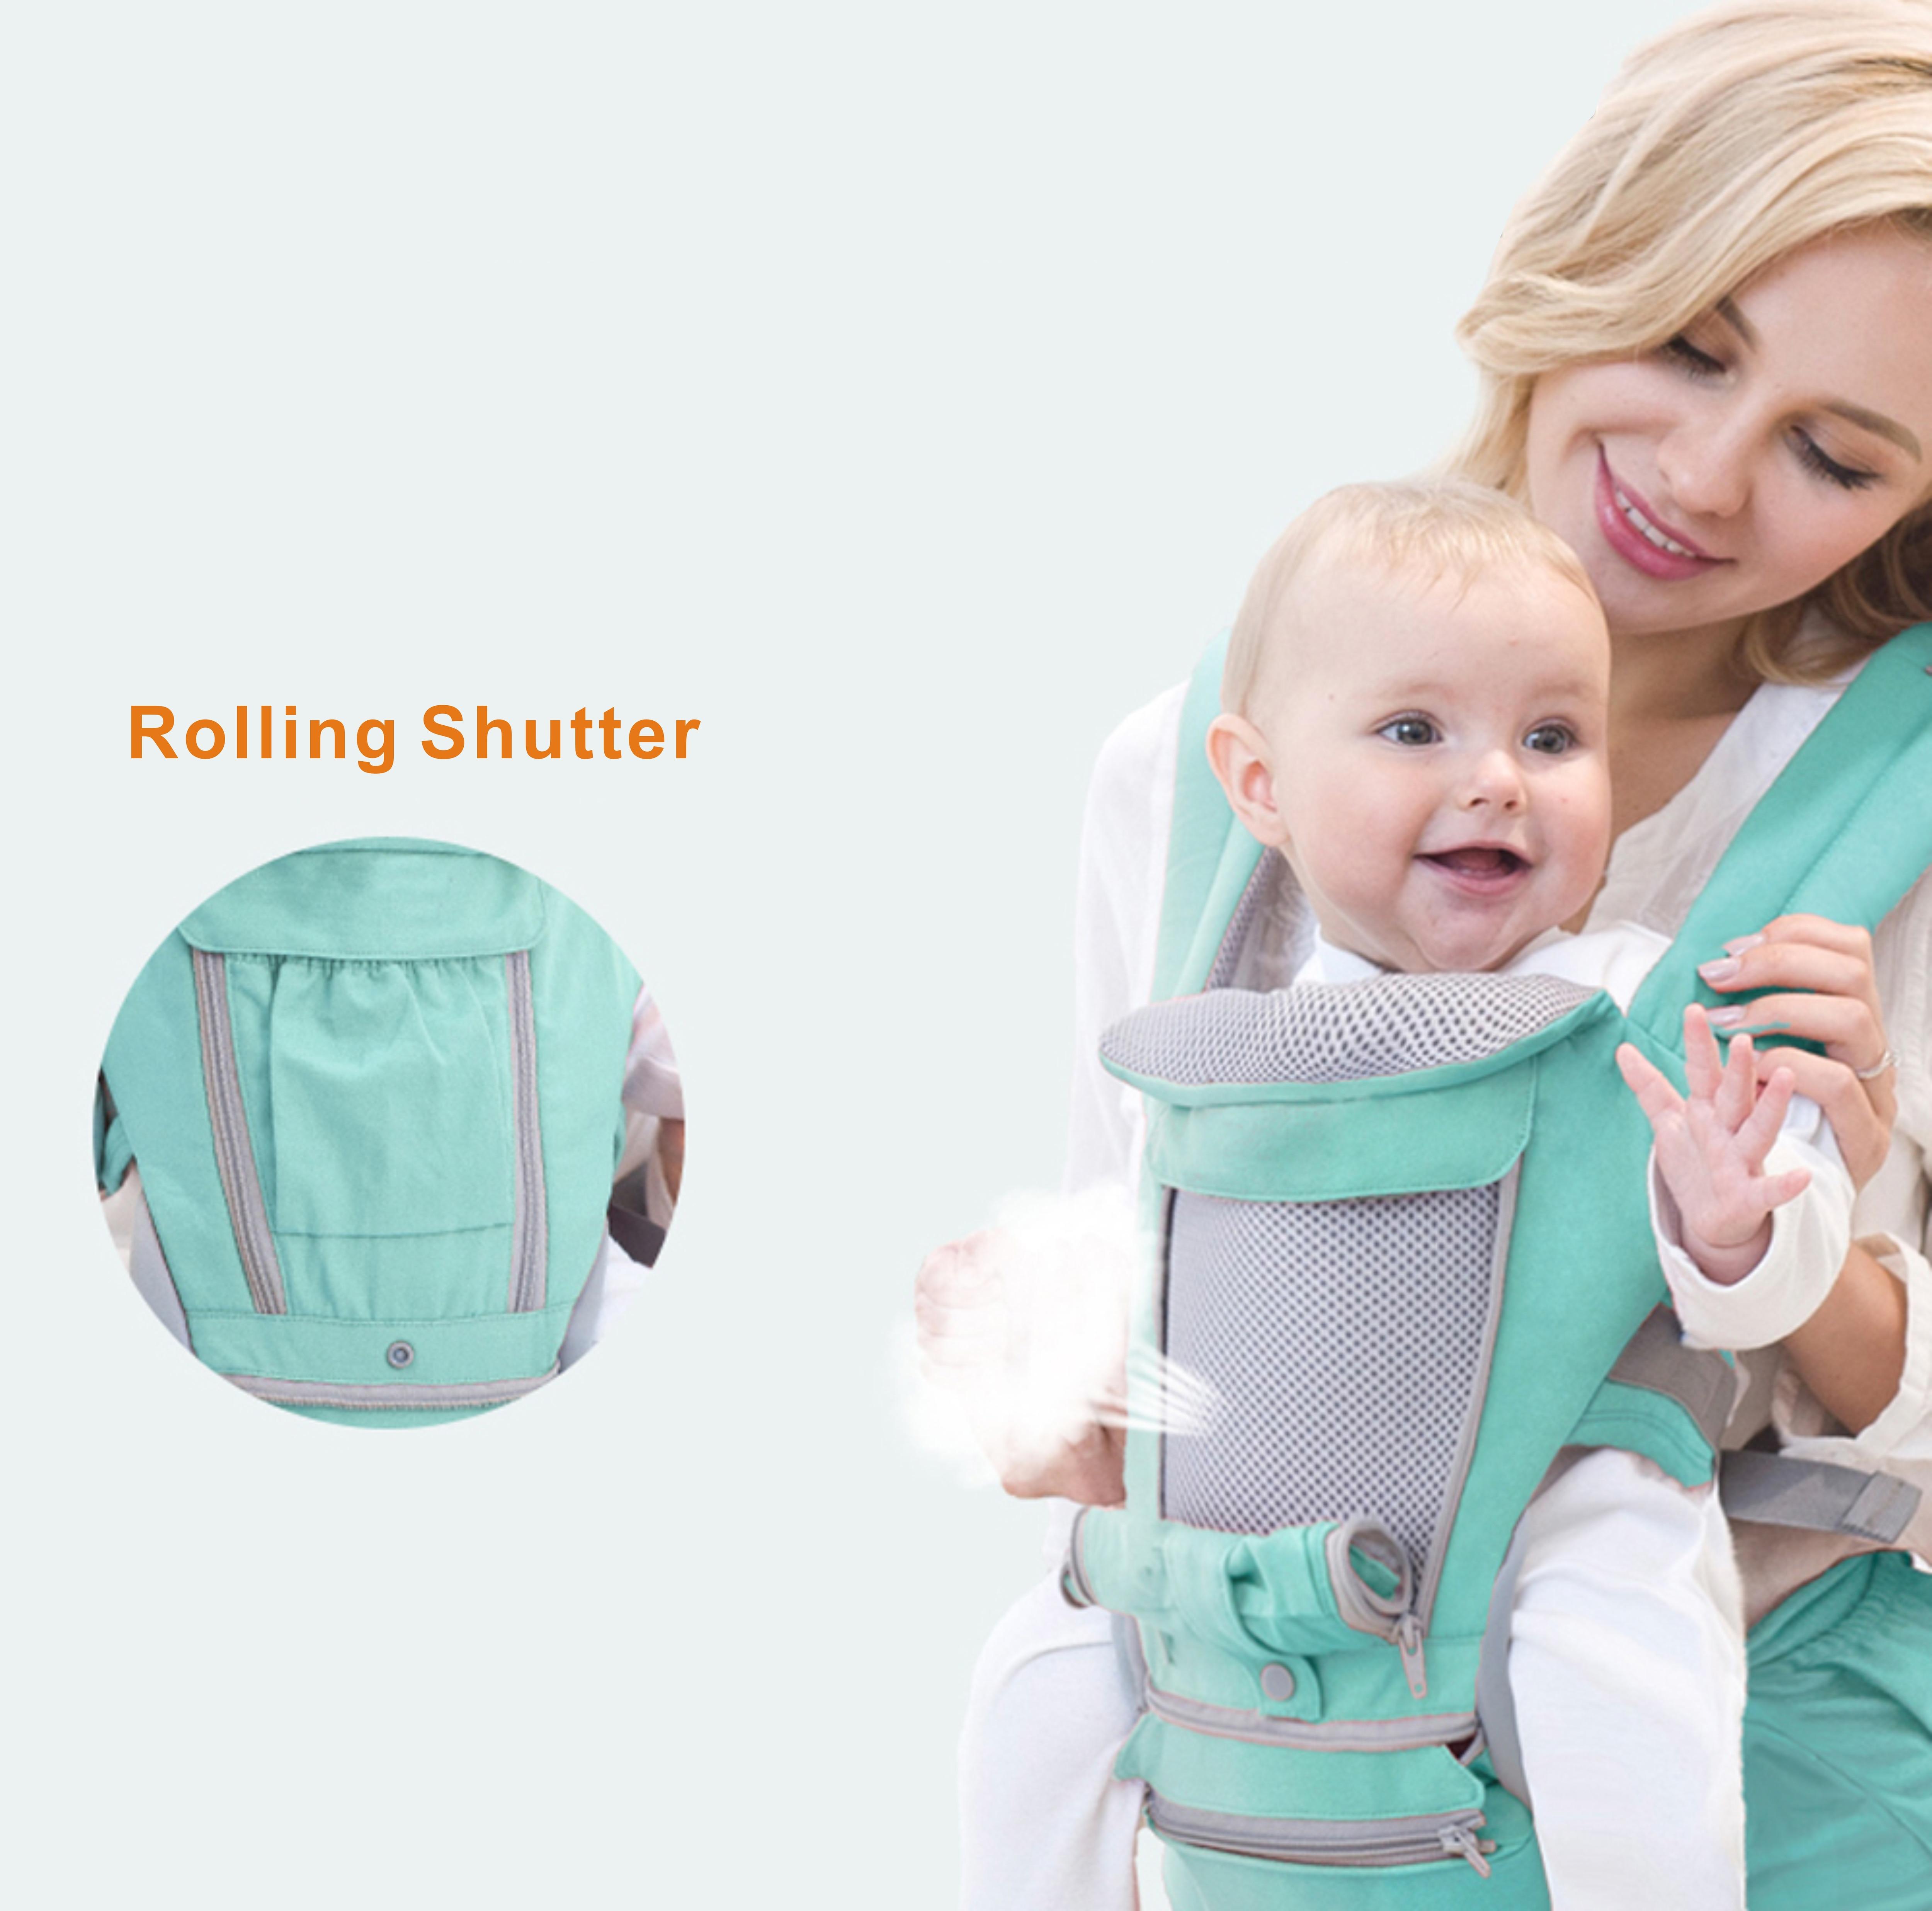 AIEBAO Atmungsaktive Ergonomische Baby Träger Rucksack Tragbare Infant Baby Carrier Kangaroo Hipseat Heaps Baby Sling Carrier Wrap